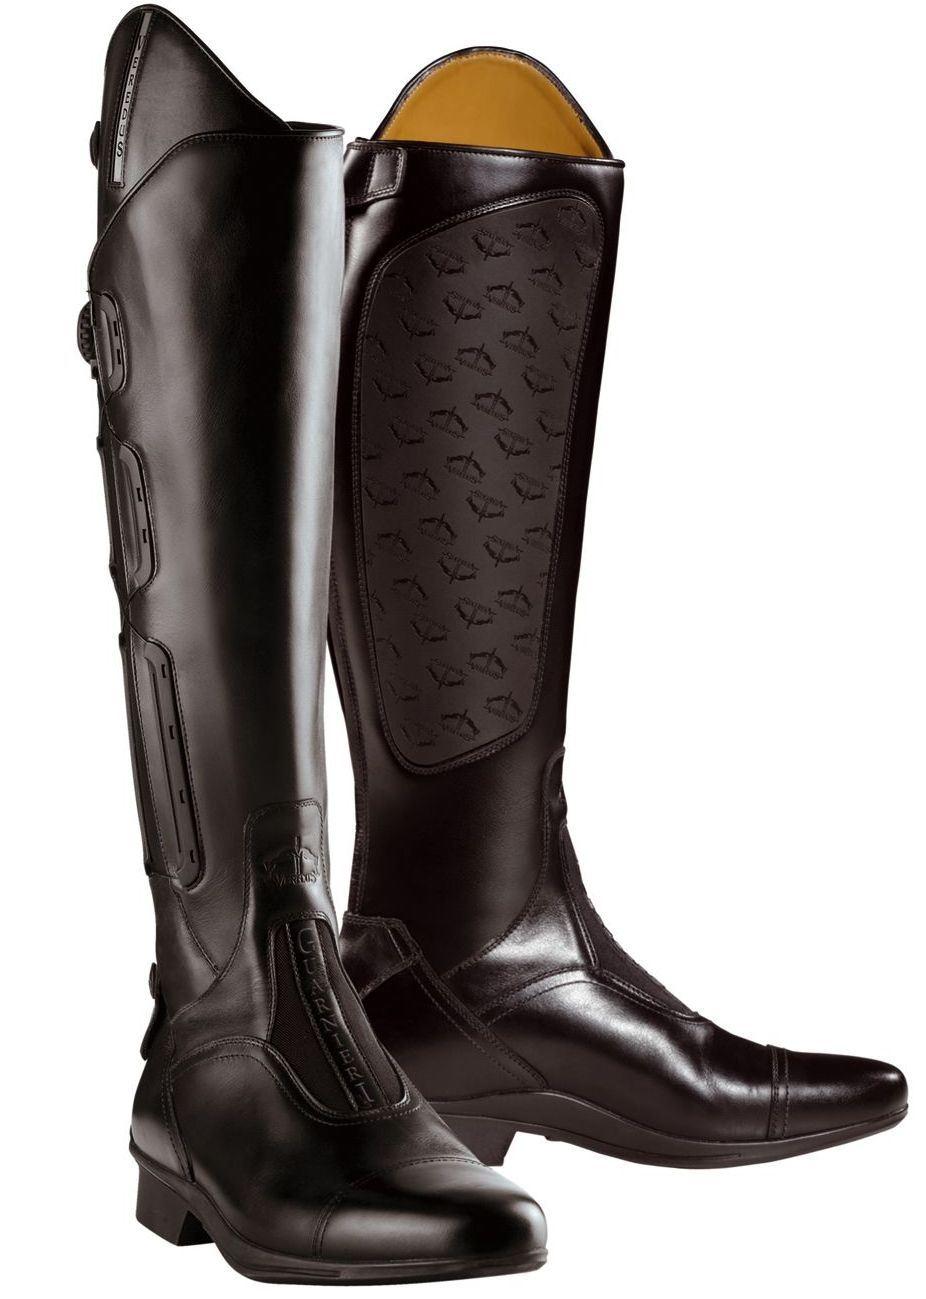 Veredus Guarnieri Long Leather Boa Riding Boot Ebay